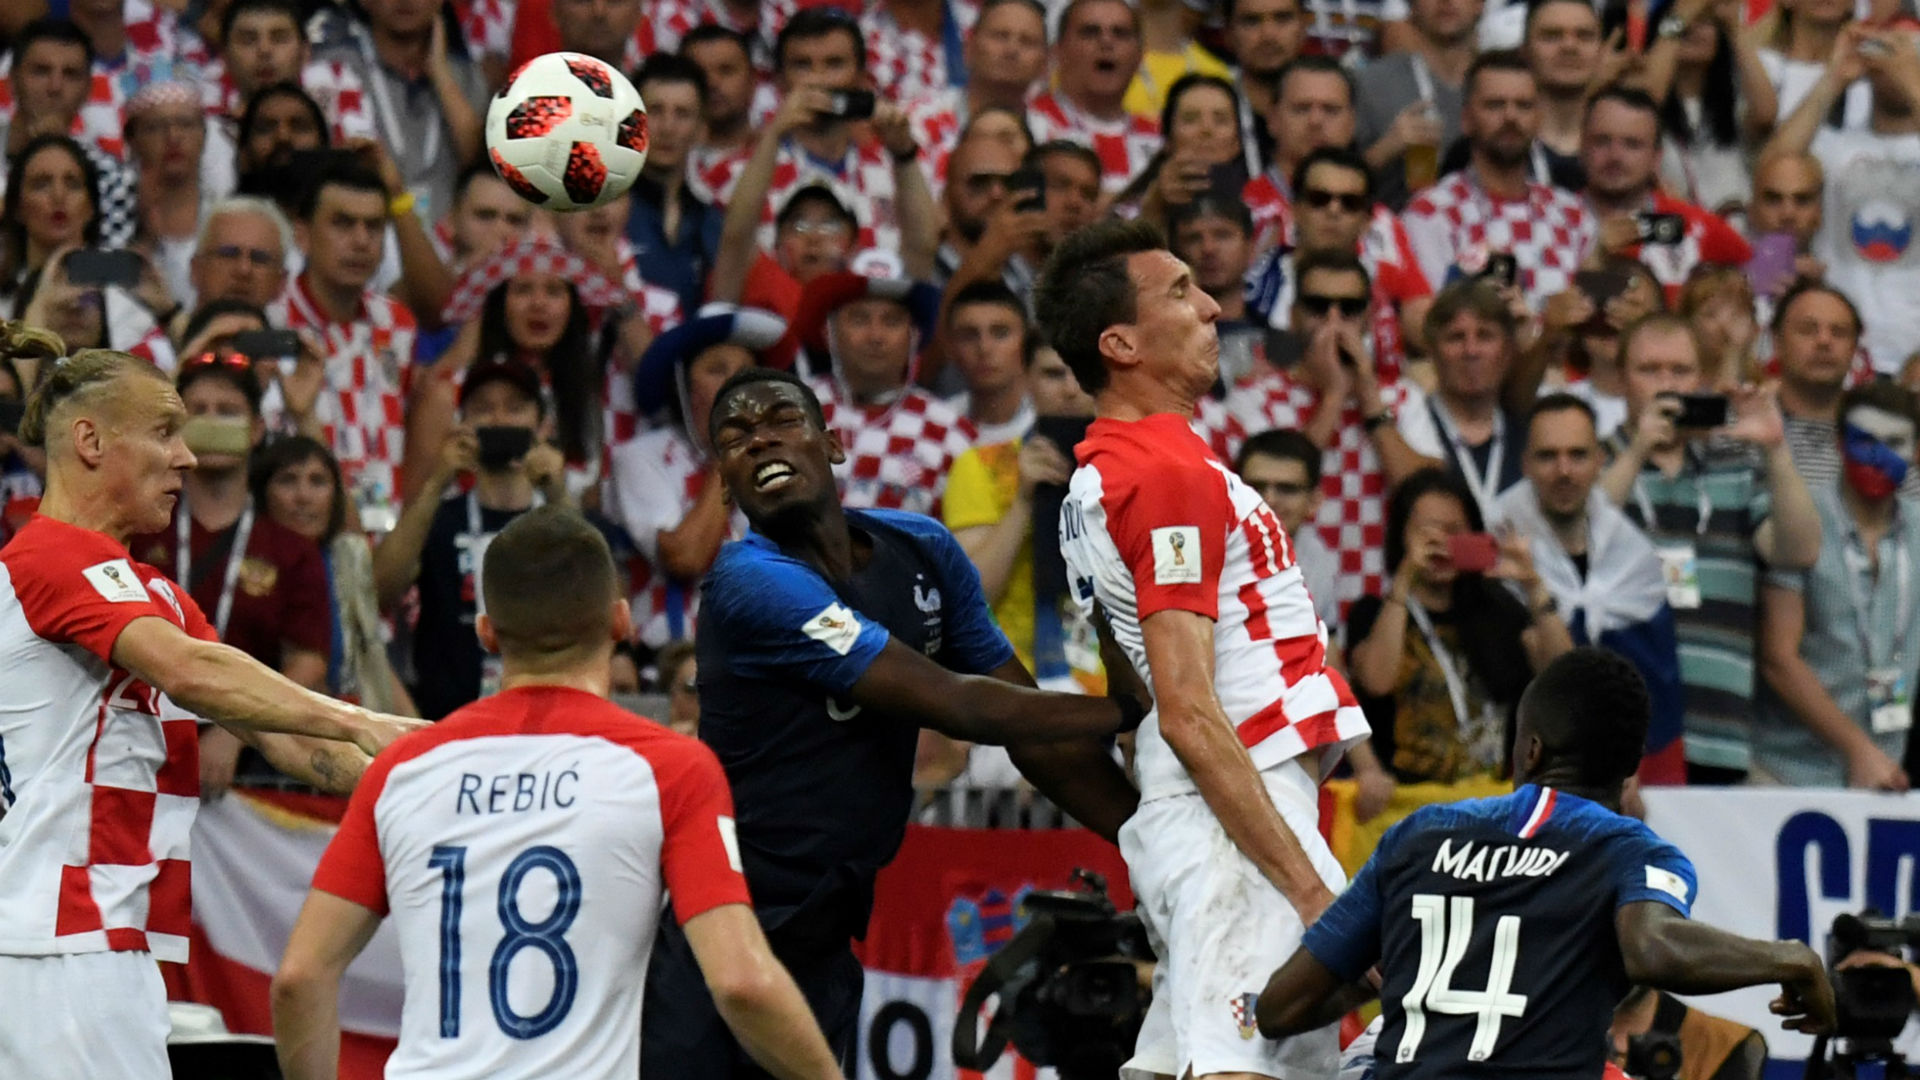 Own goal Mario Mandzukic Croatia World Cup 2018 final